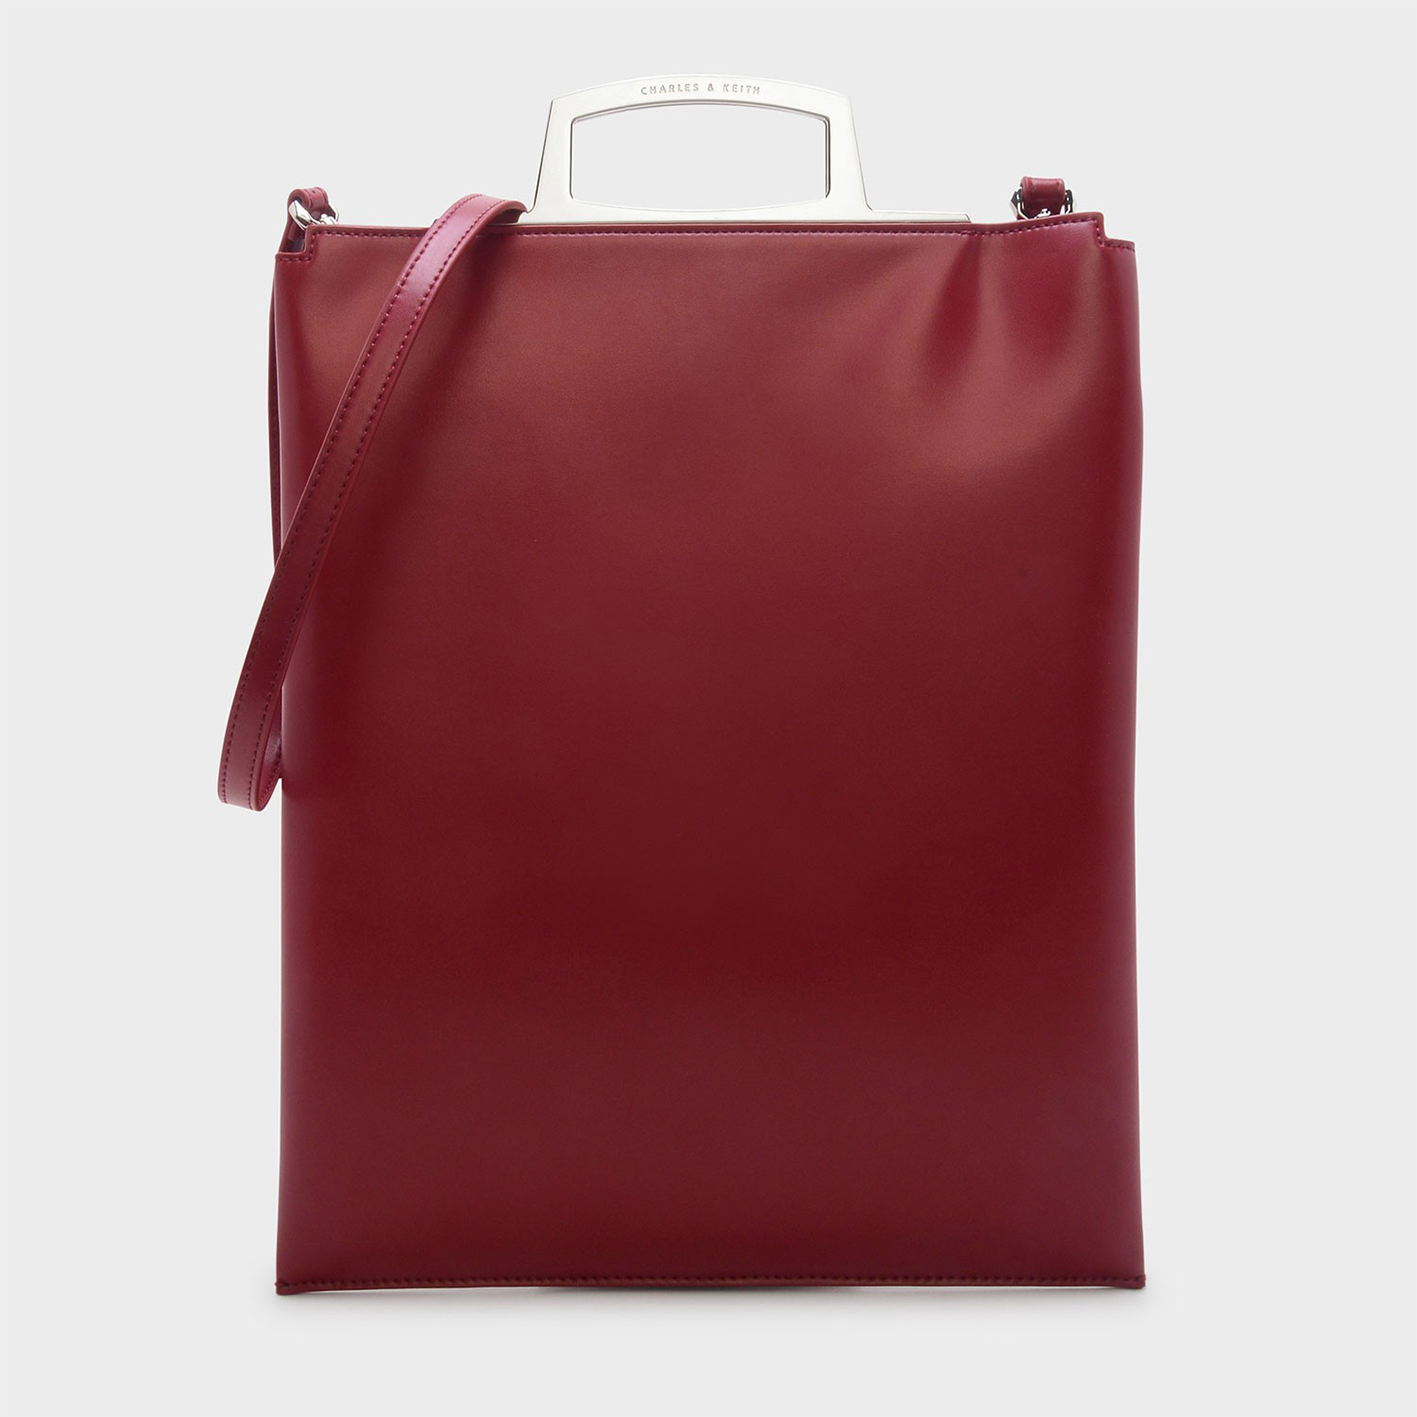 Metallic Handle Tote Bag, £69, Charles & Keith